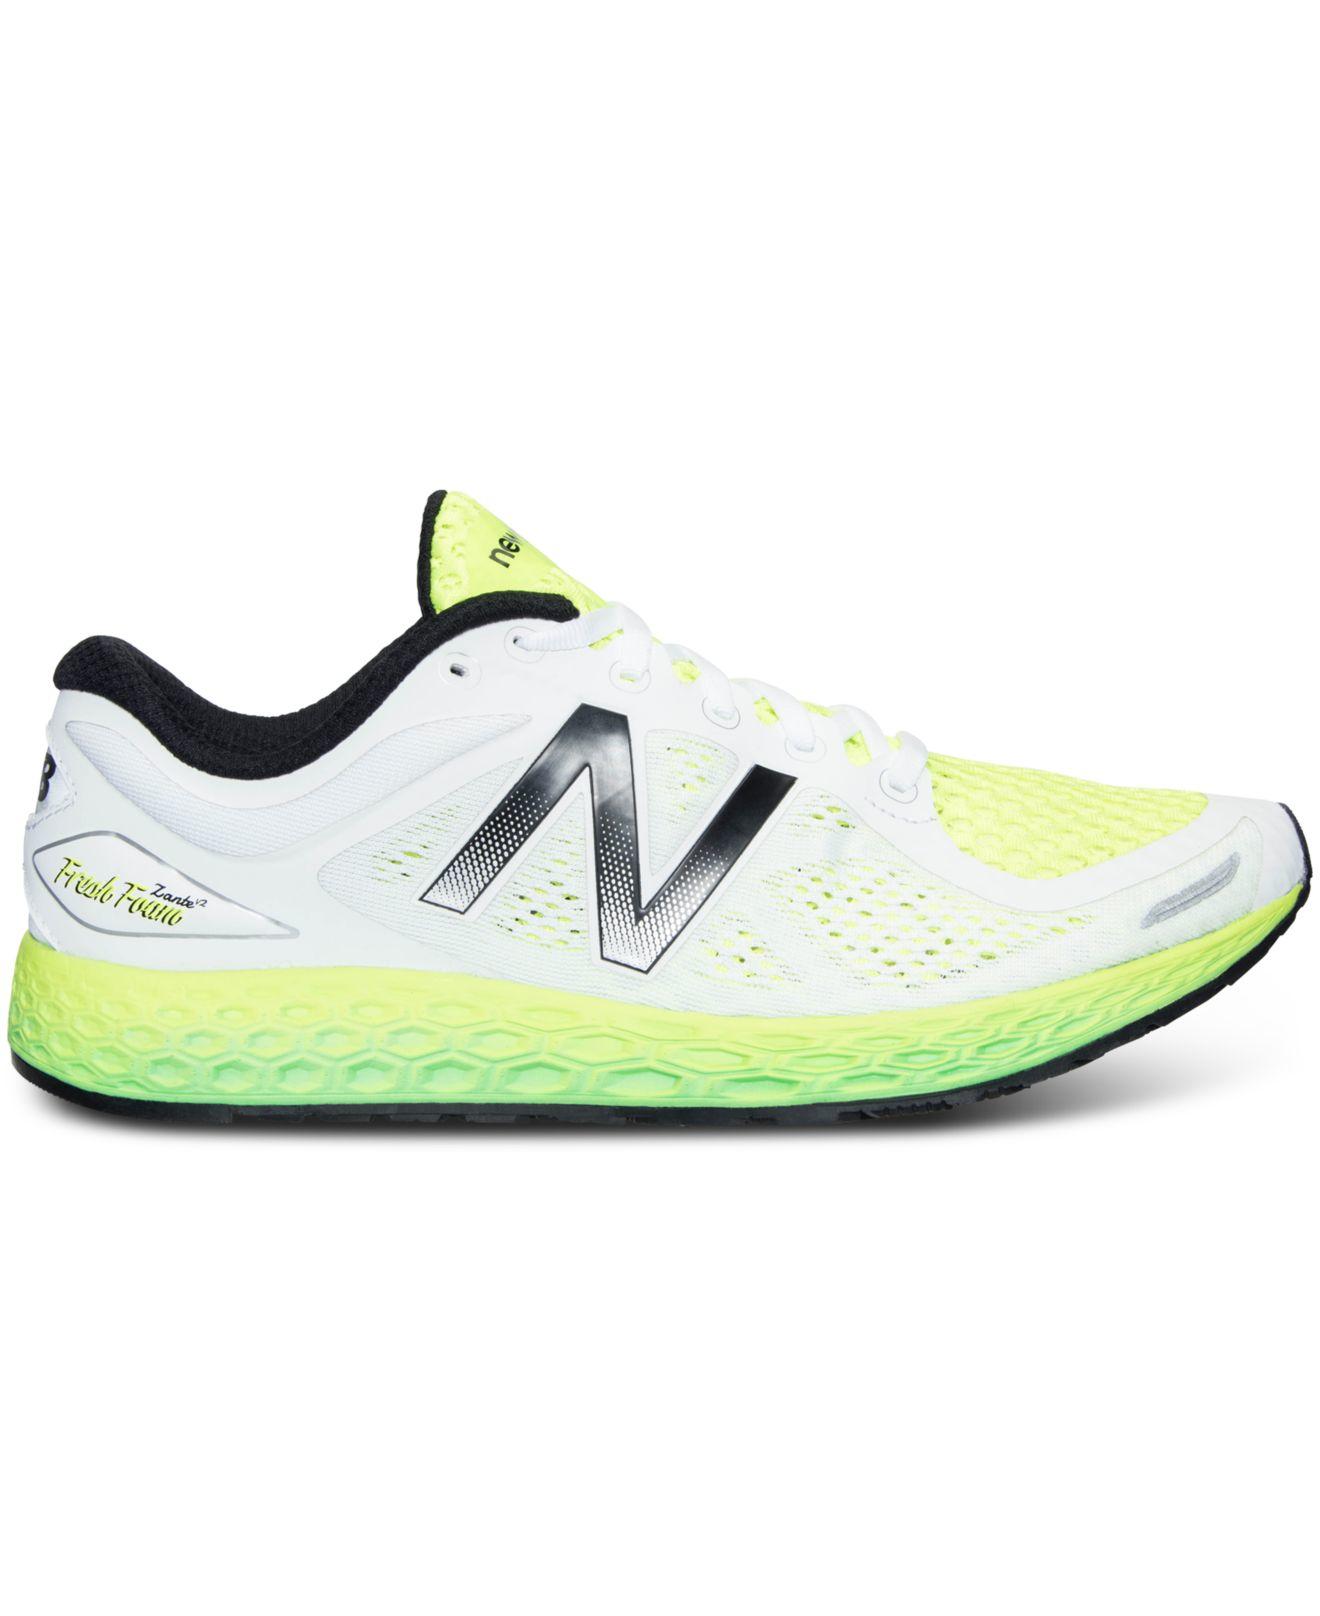 Macys Mens Adidas Shoes Green